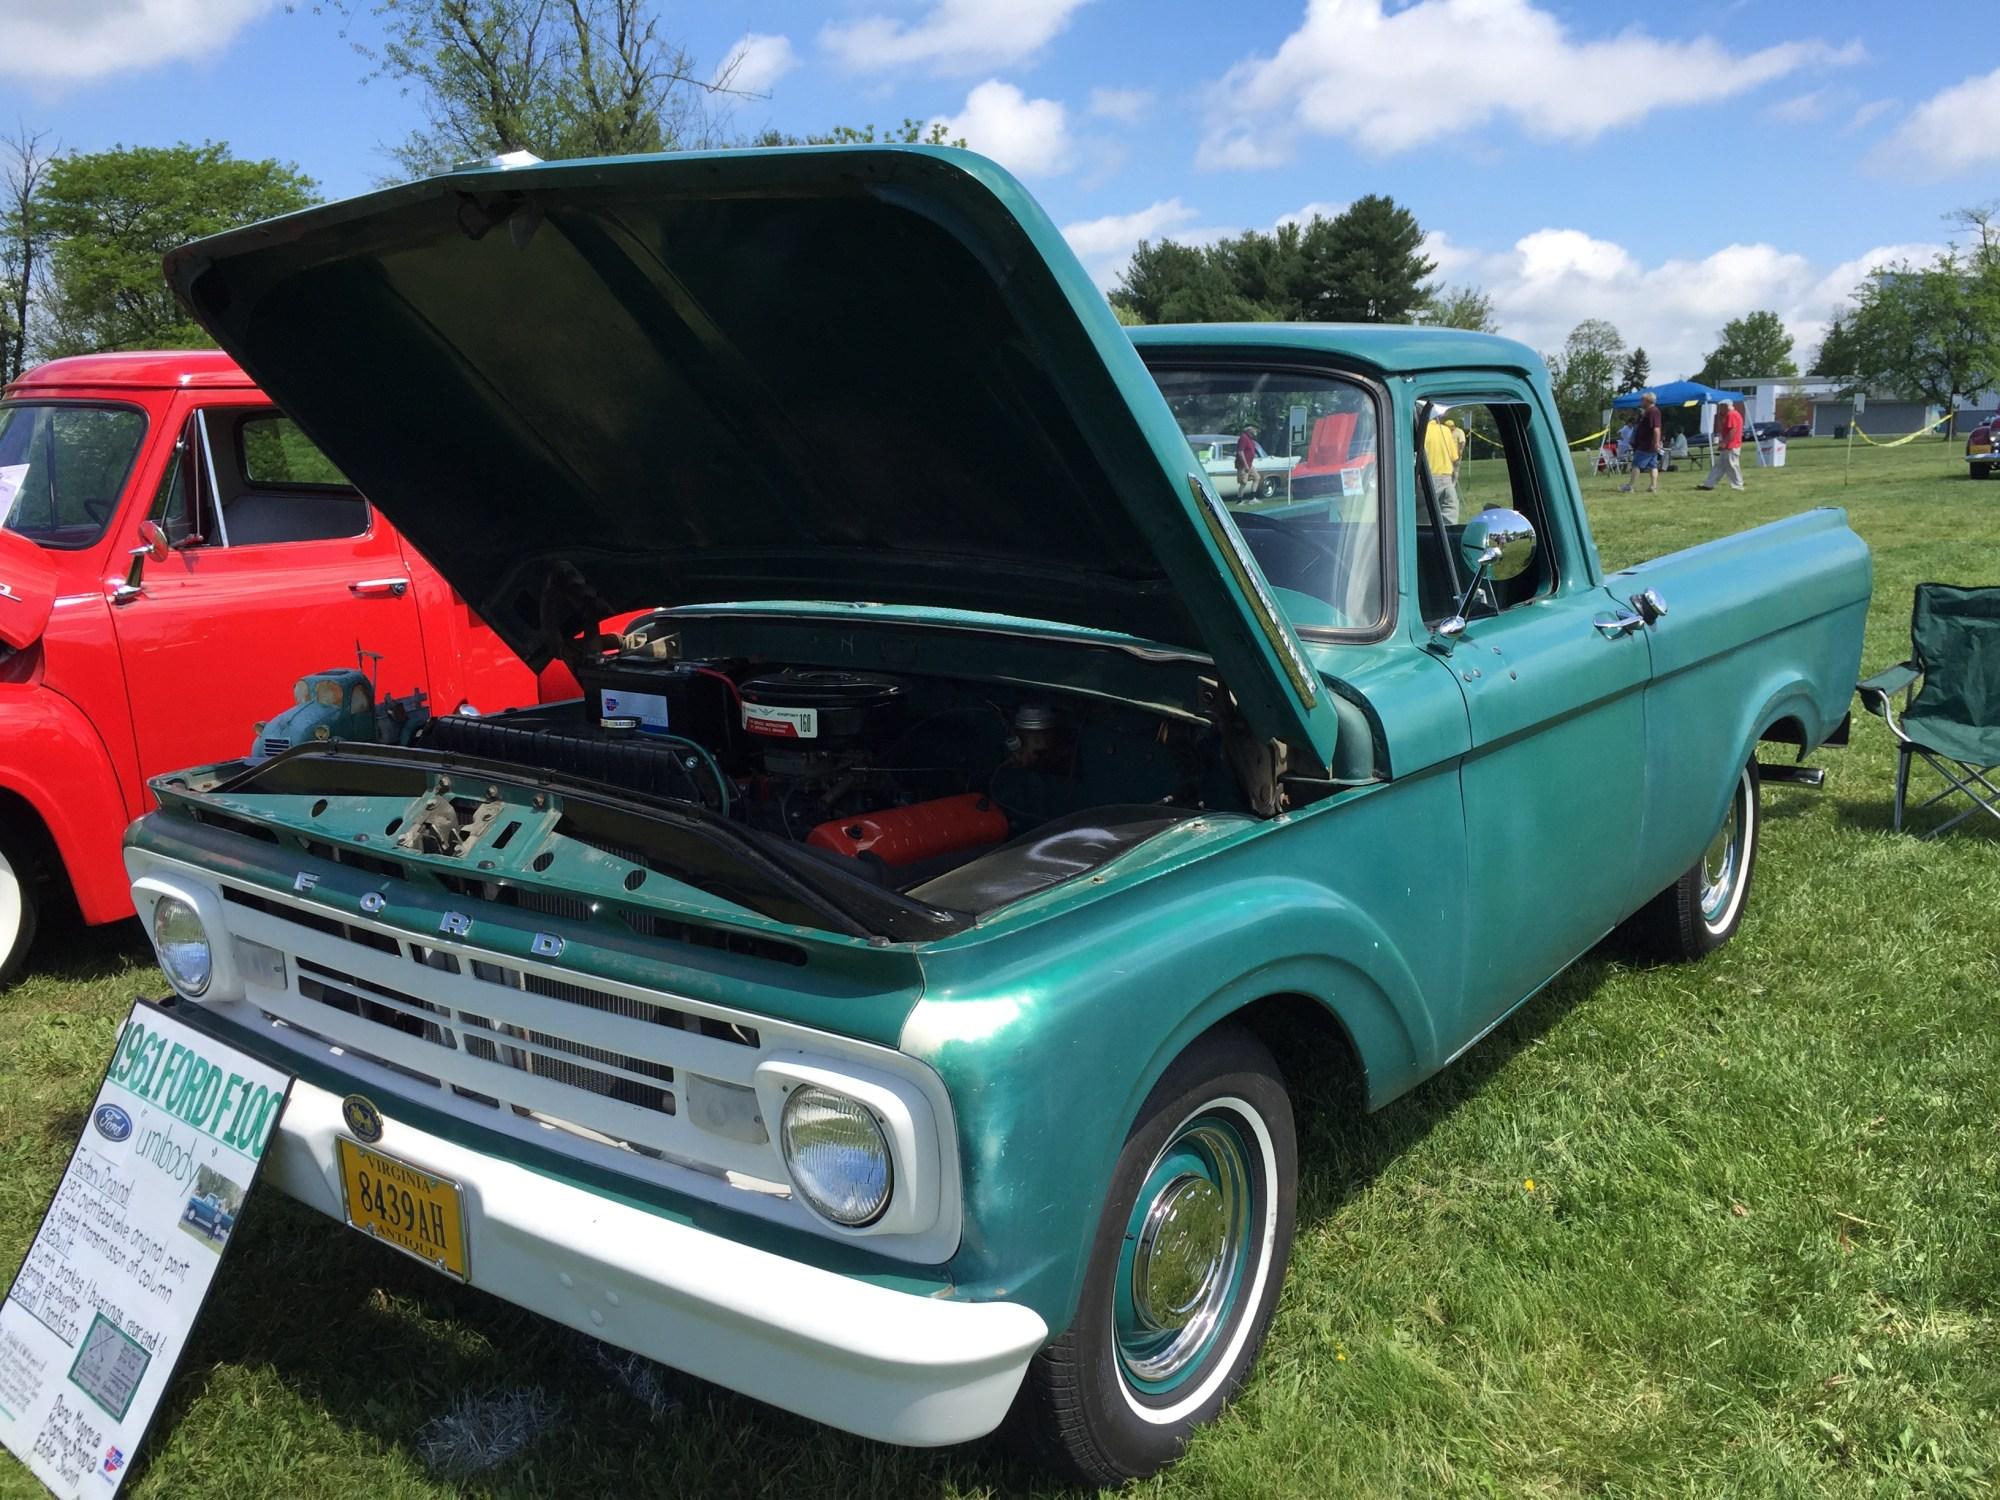 hight resolution of file 1961 ford f100 unibody pickup design factory original at 2015 shenandoah aaca meet 1of6 jpg